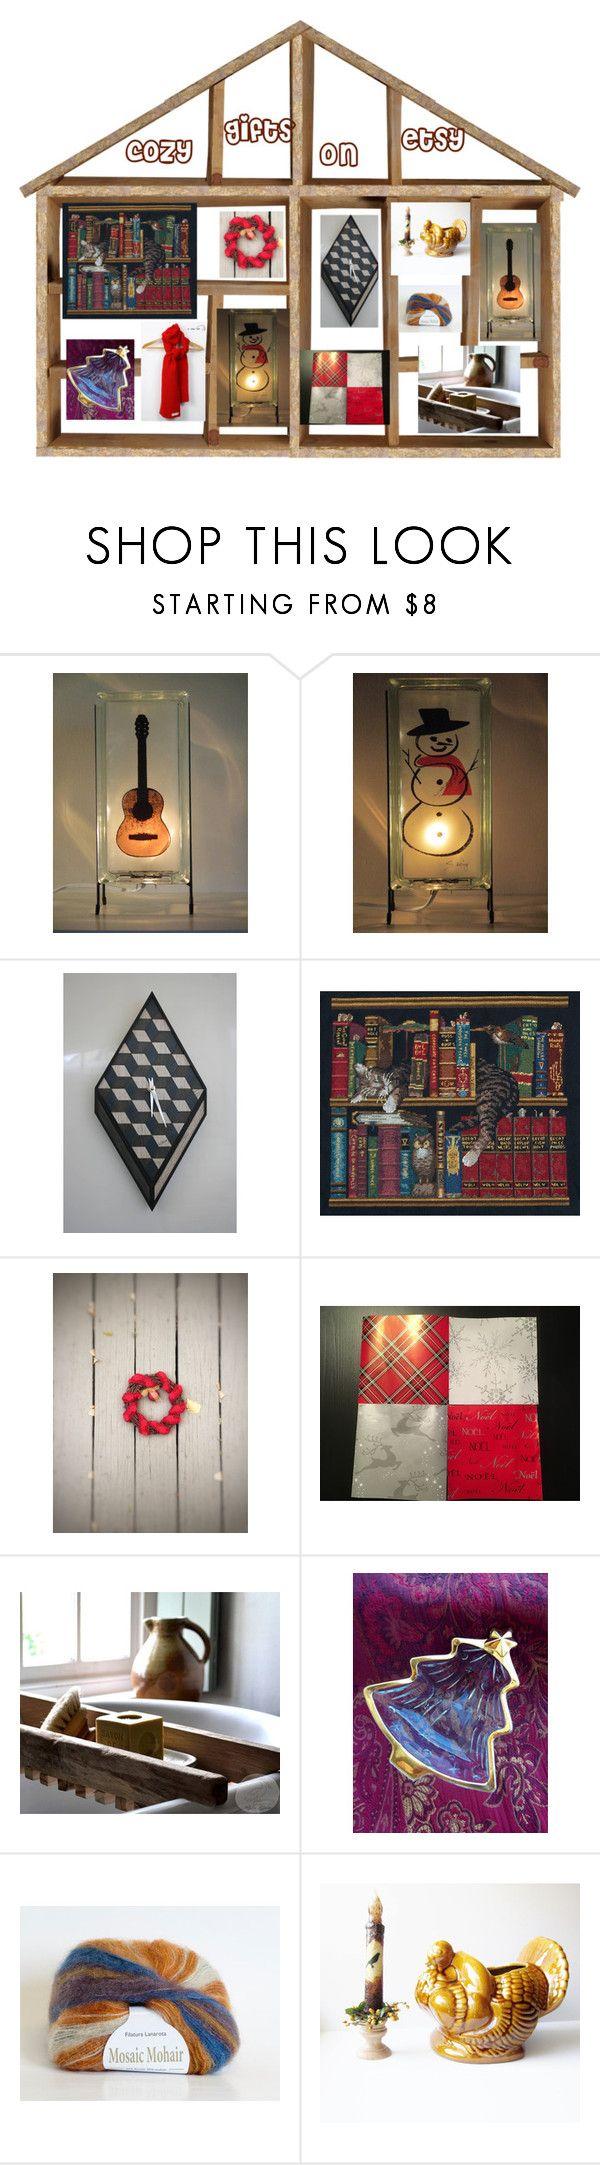 Cozy Gift Ideas by glowblocks on Polyvore featuring interior, interiors, interior design, home, home decor, interior decorating and Hostess